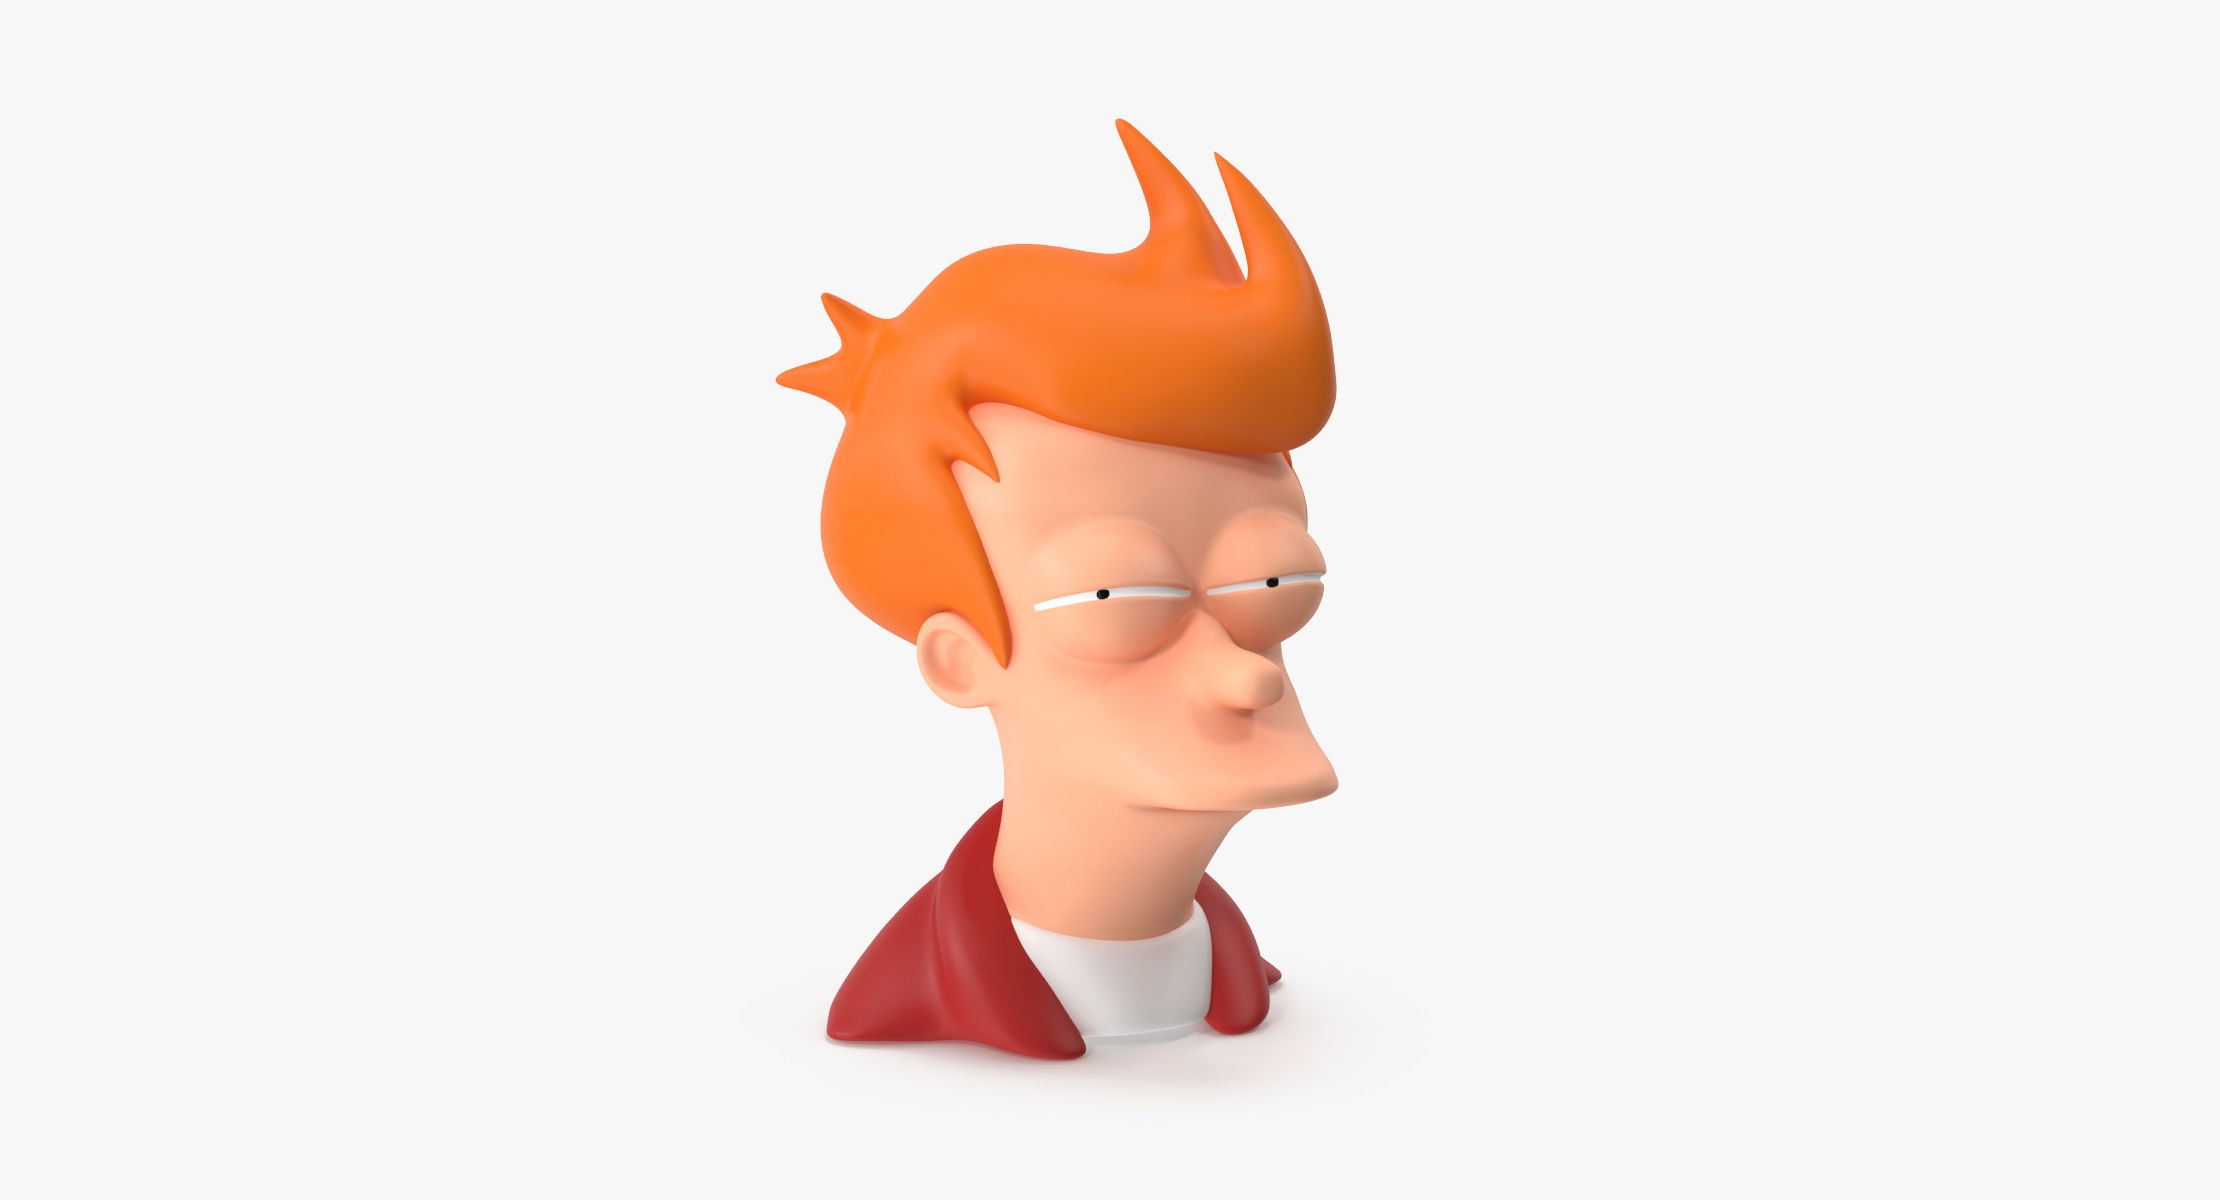 Fry 01 - Not Sure If - reel 1